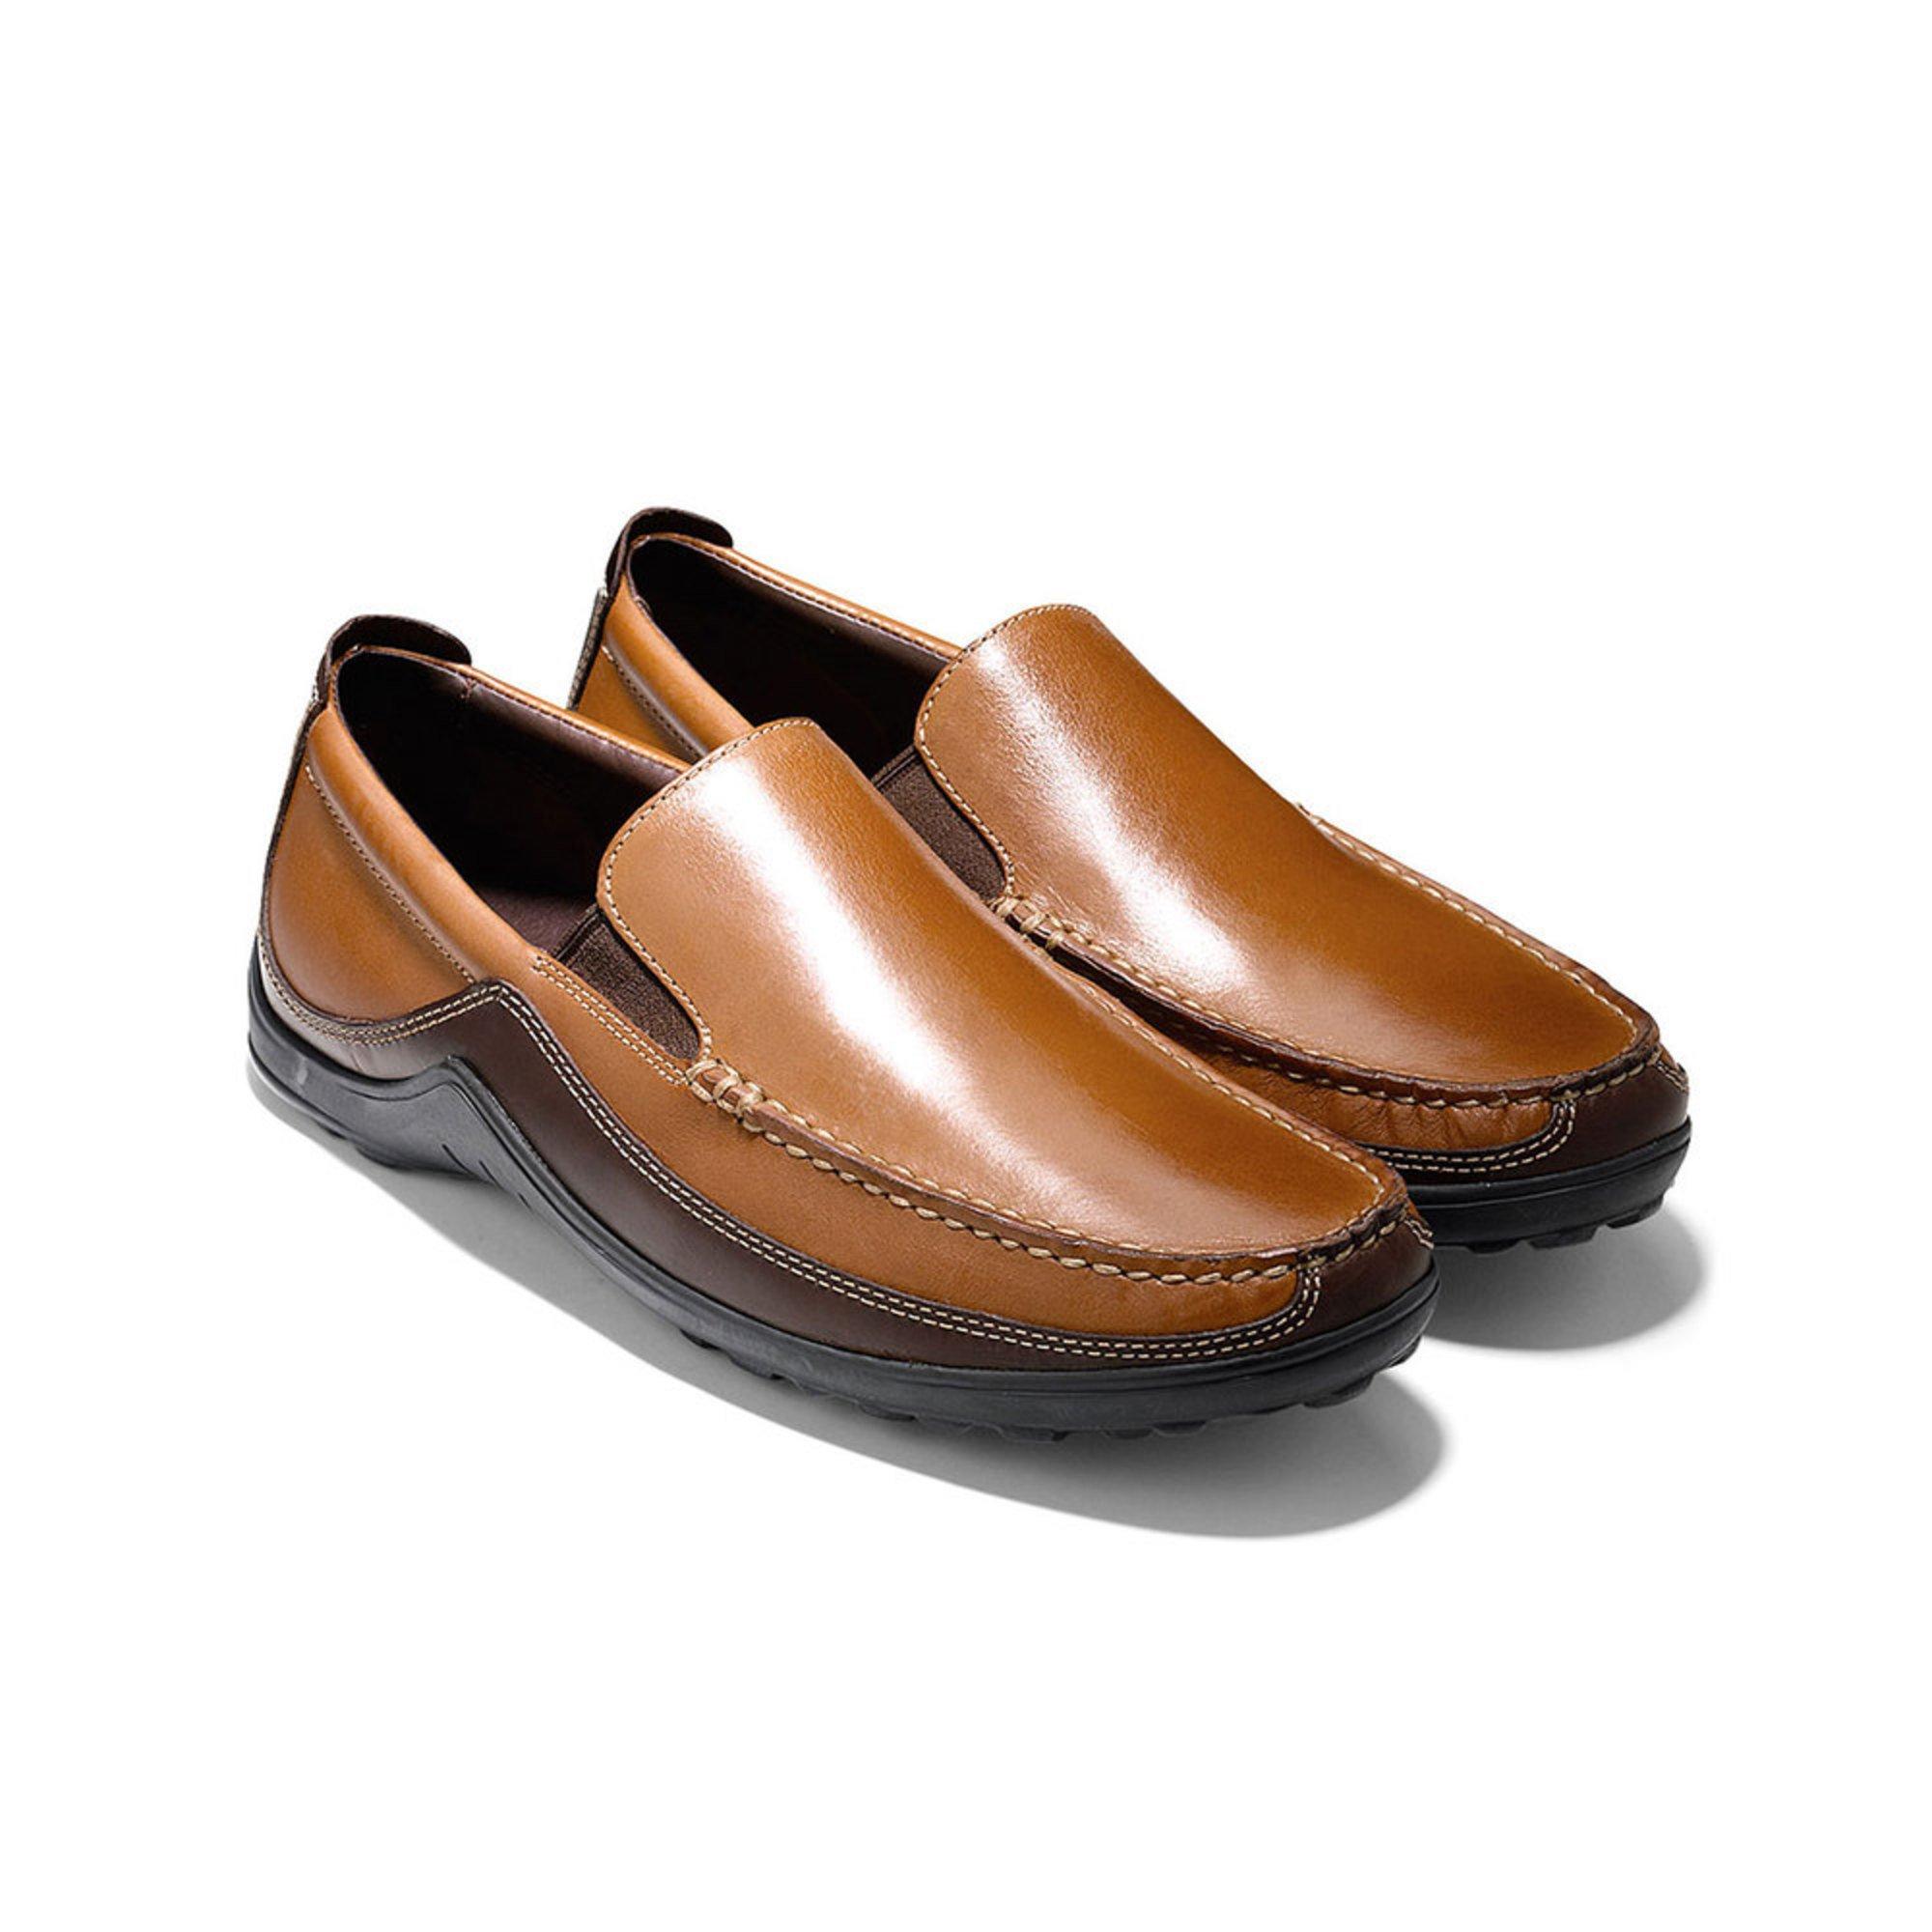 4b6055a9b8e Cole Haan. Cole Haan Men s Tucker Venetian Loafer